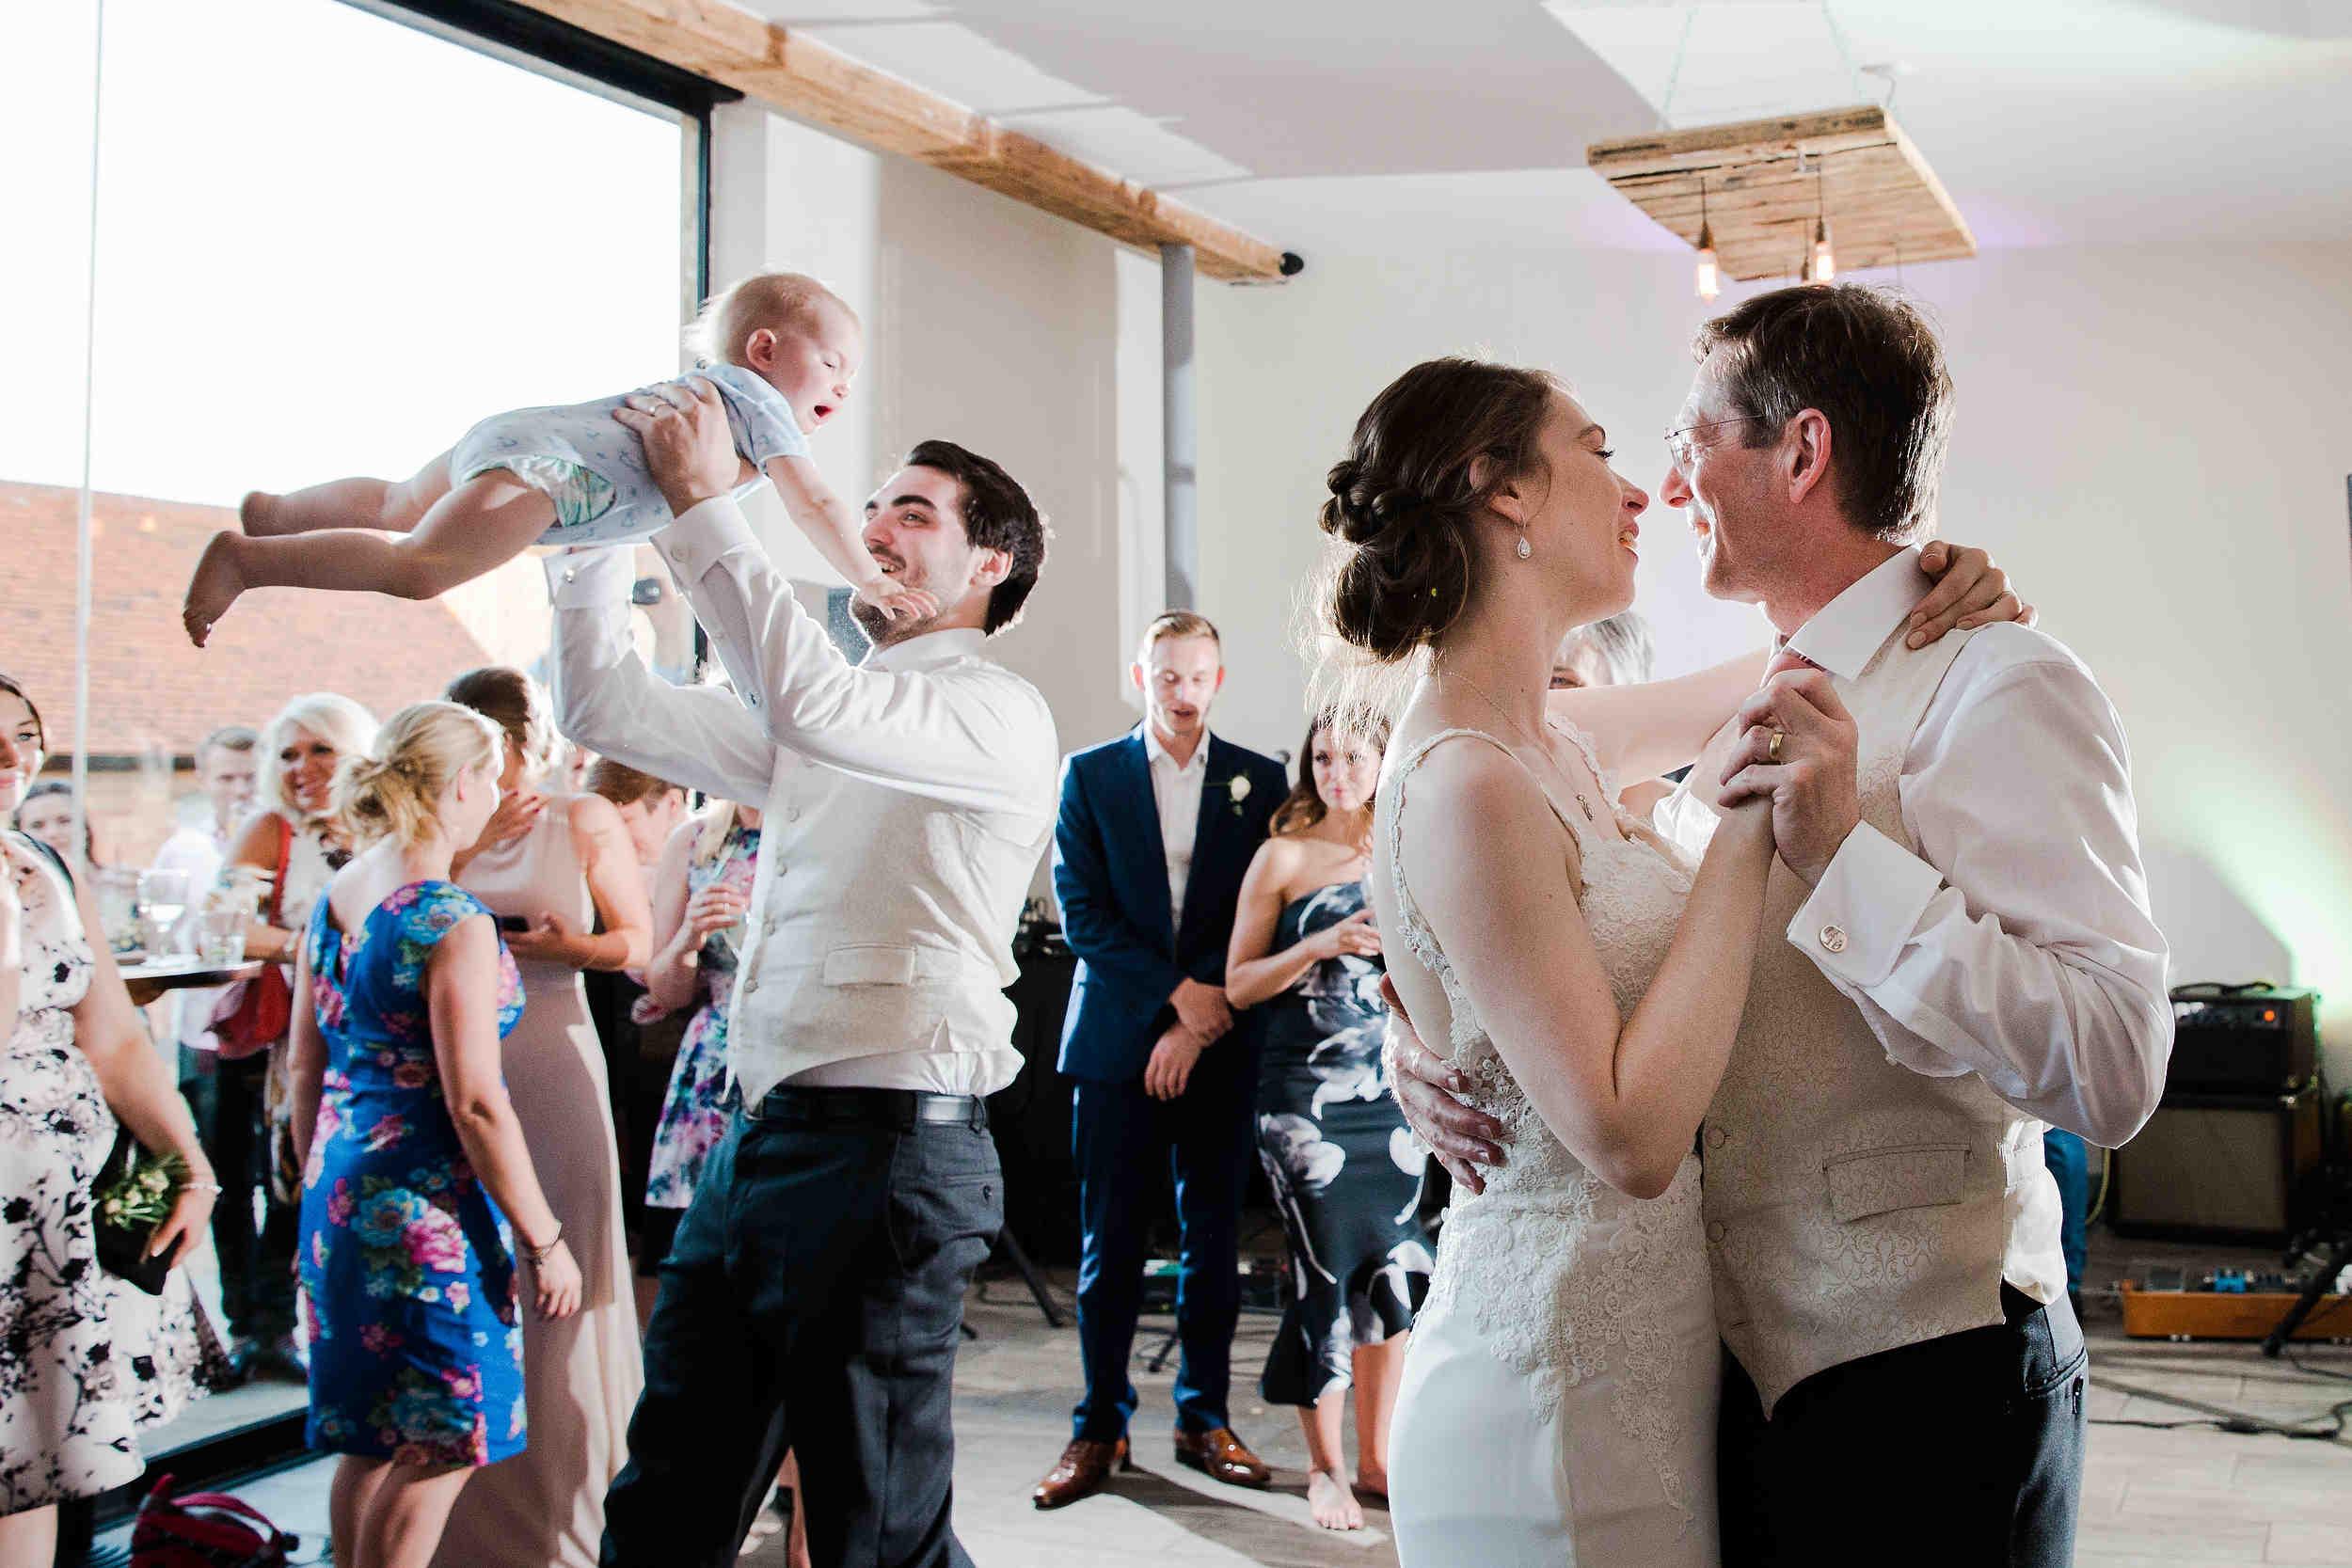 Modern_Stylish_Wedding_at_Swallows_Nest_Barn1310